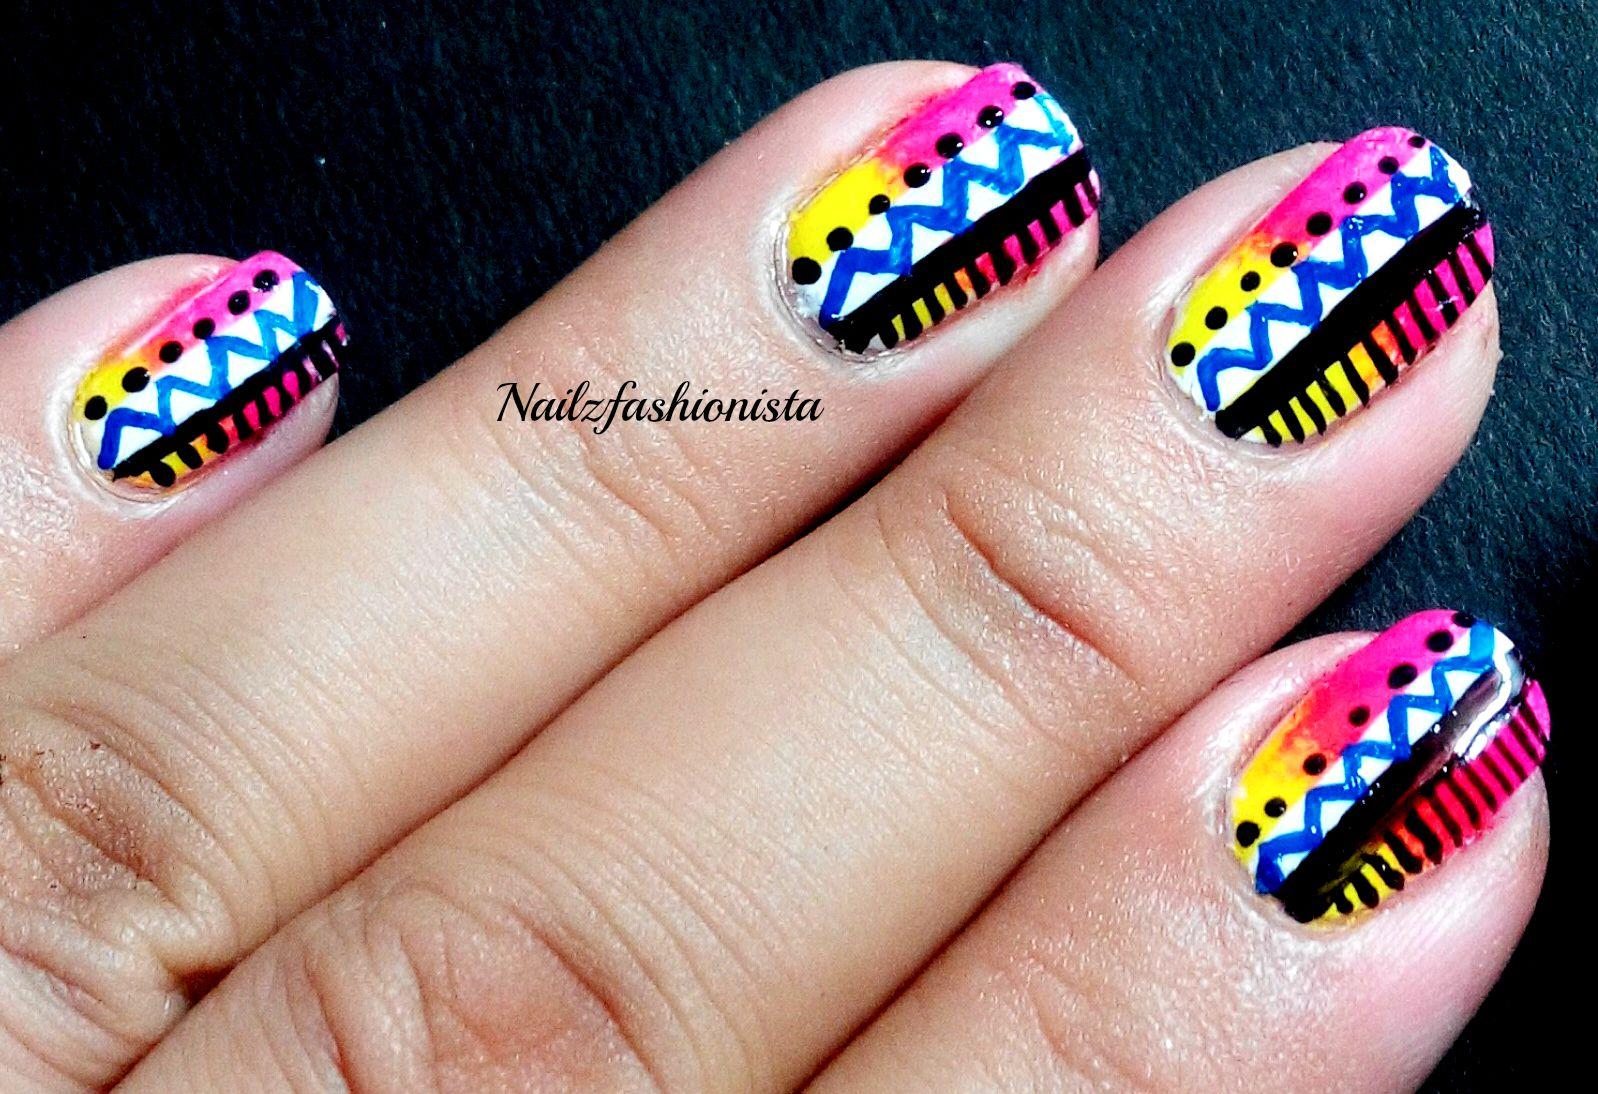 Nailzfashionista: Neon Tribal Nail Art in Collaboration With FLIPKART